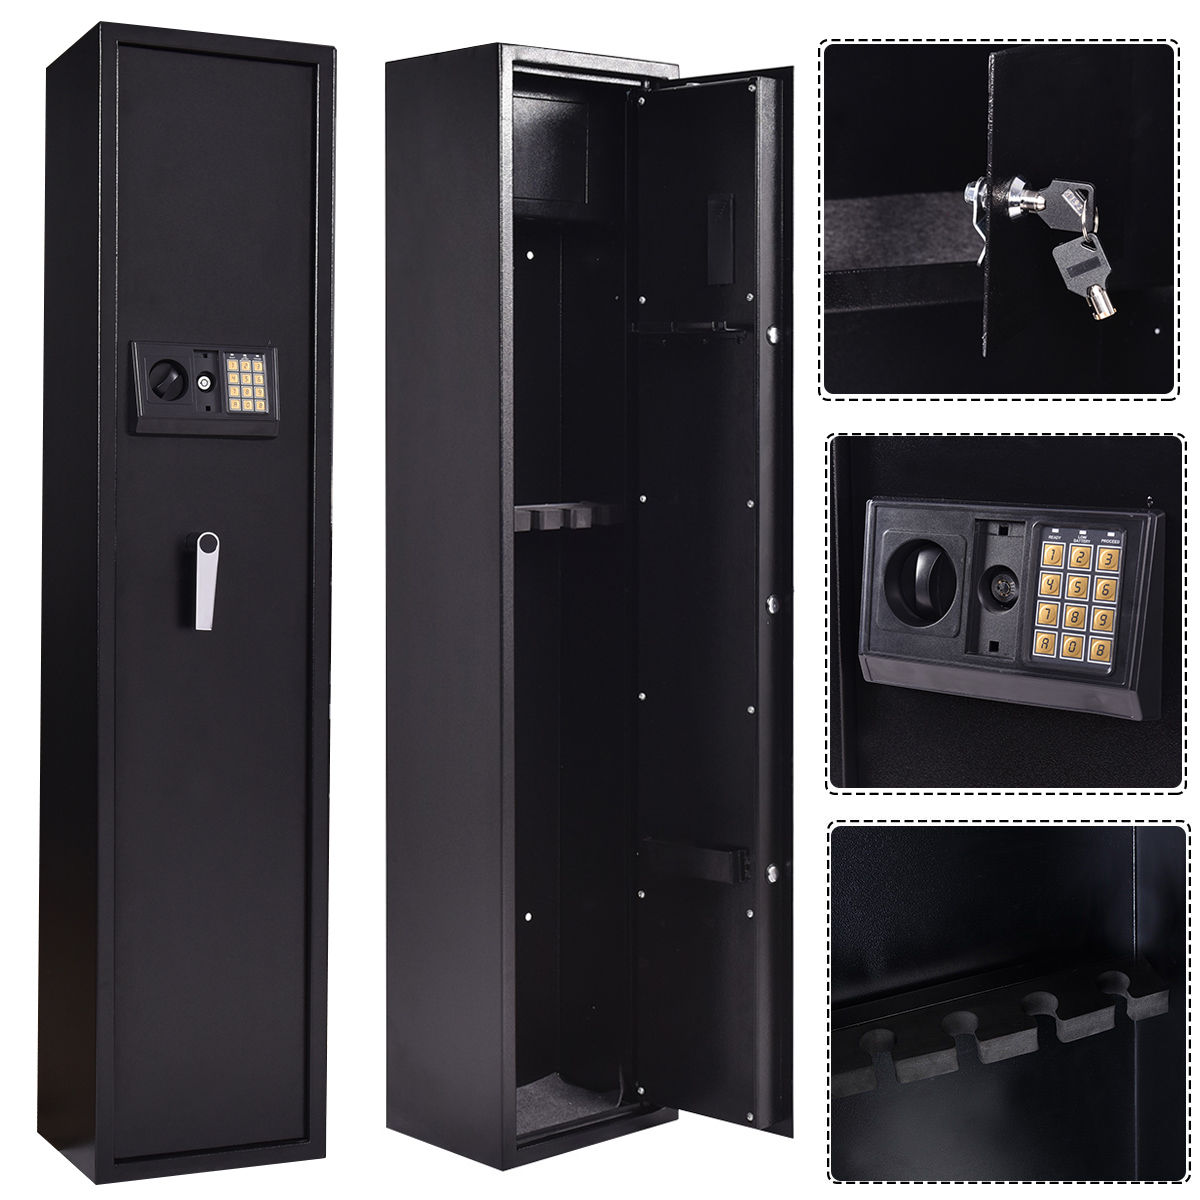 Giantex New 5 Rifle Electronic Lock Gun Storage Safe Cabinet Modern Steel Digital Security Safe Lockbox Gun Case Hw53780 Living Room Furniture Furniture